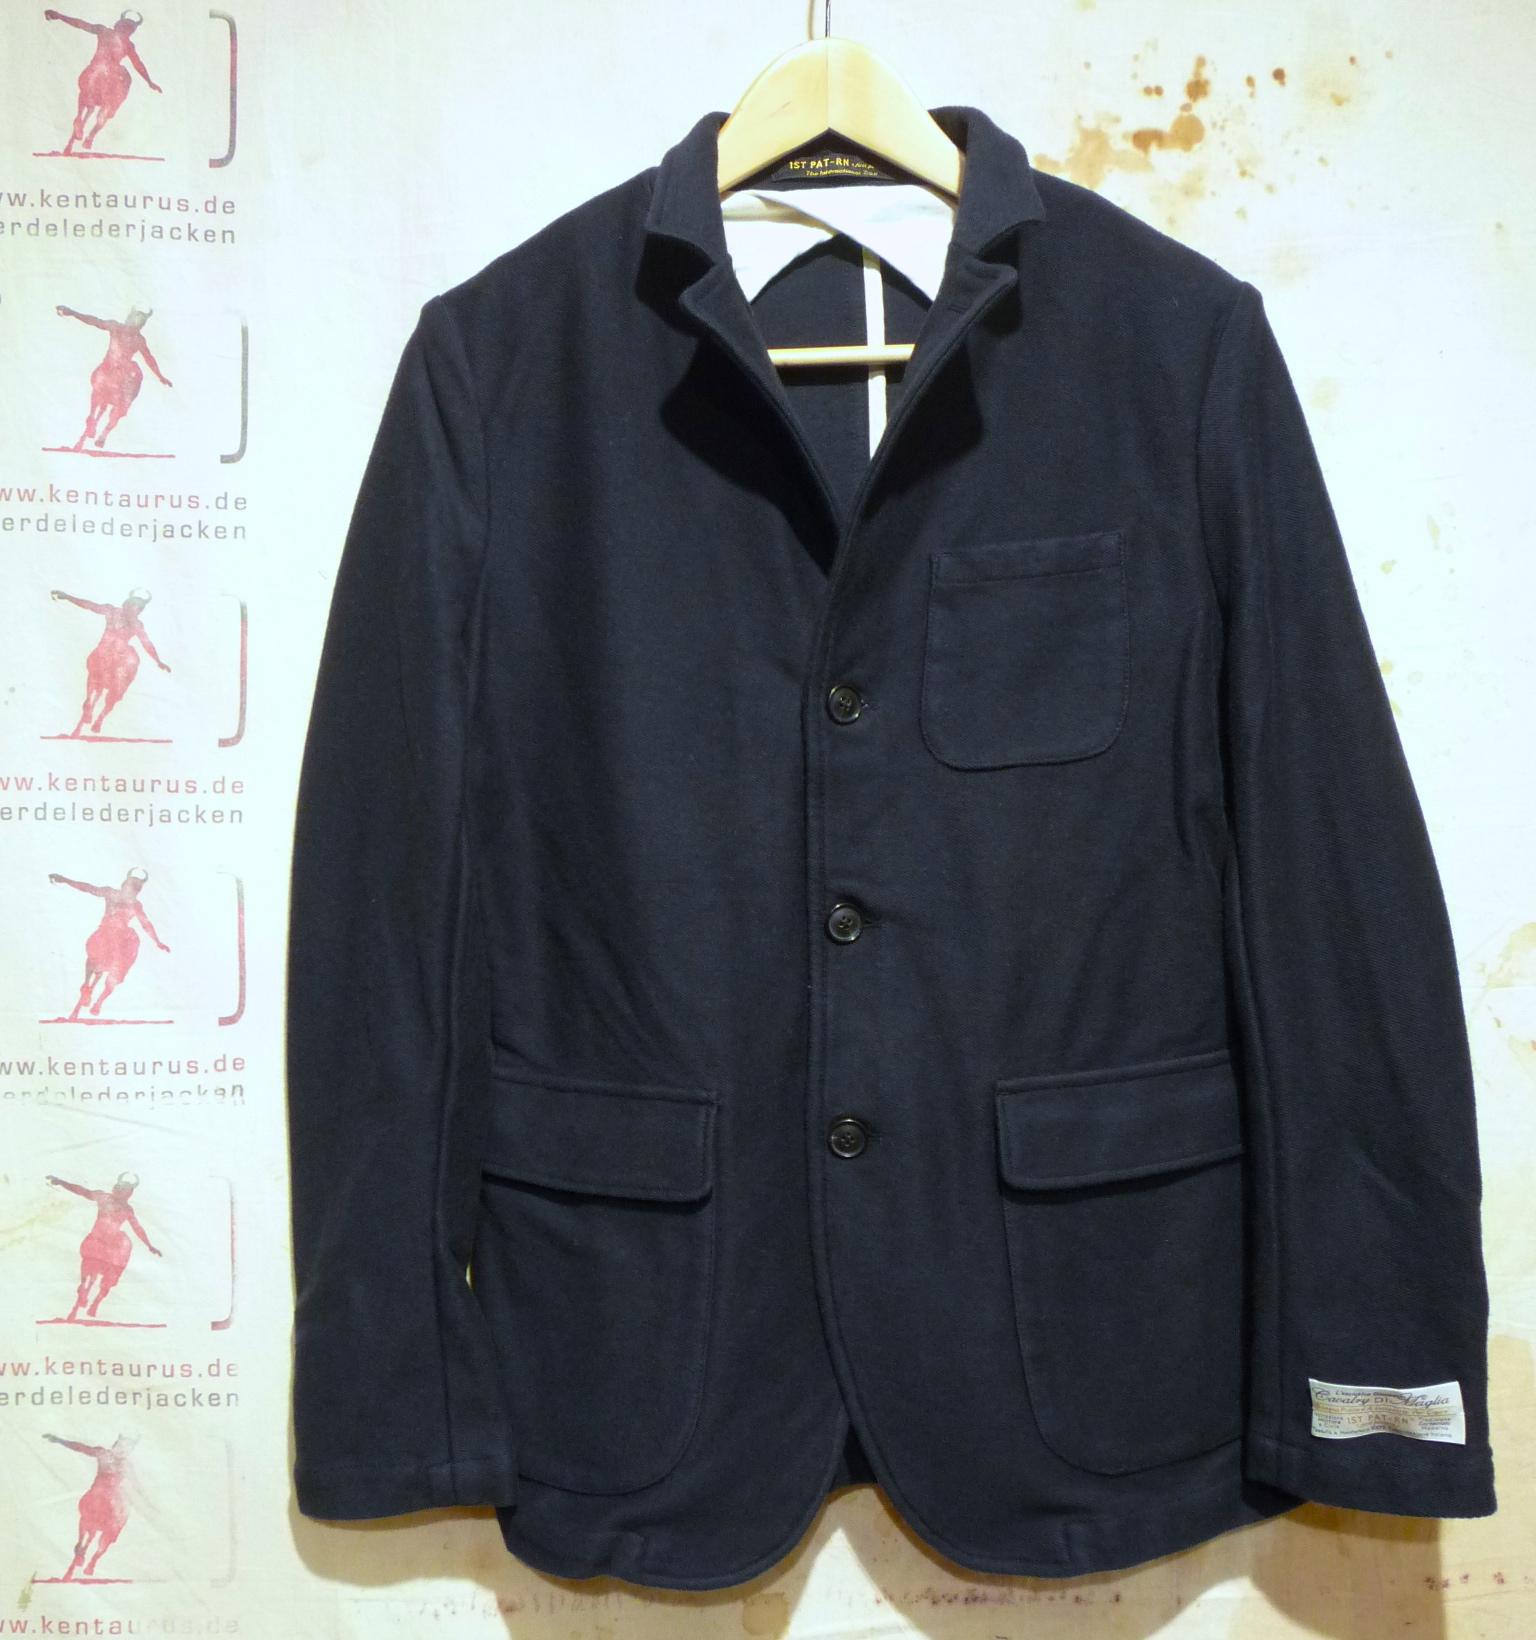 1st pat-rn campus jacket